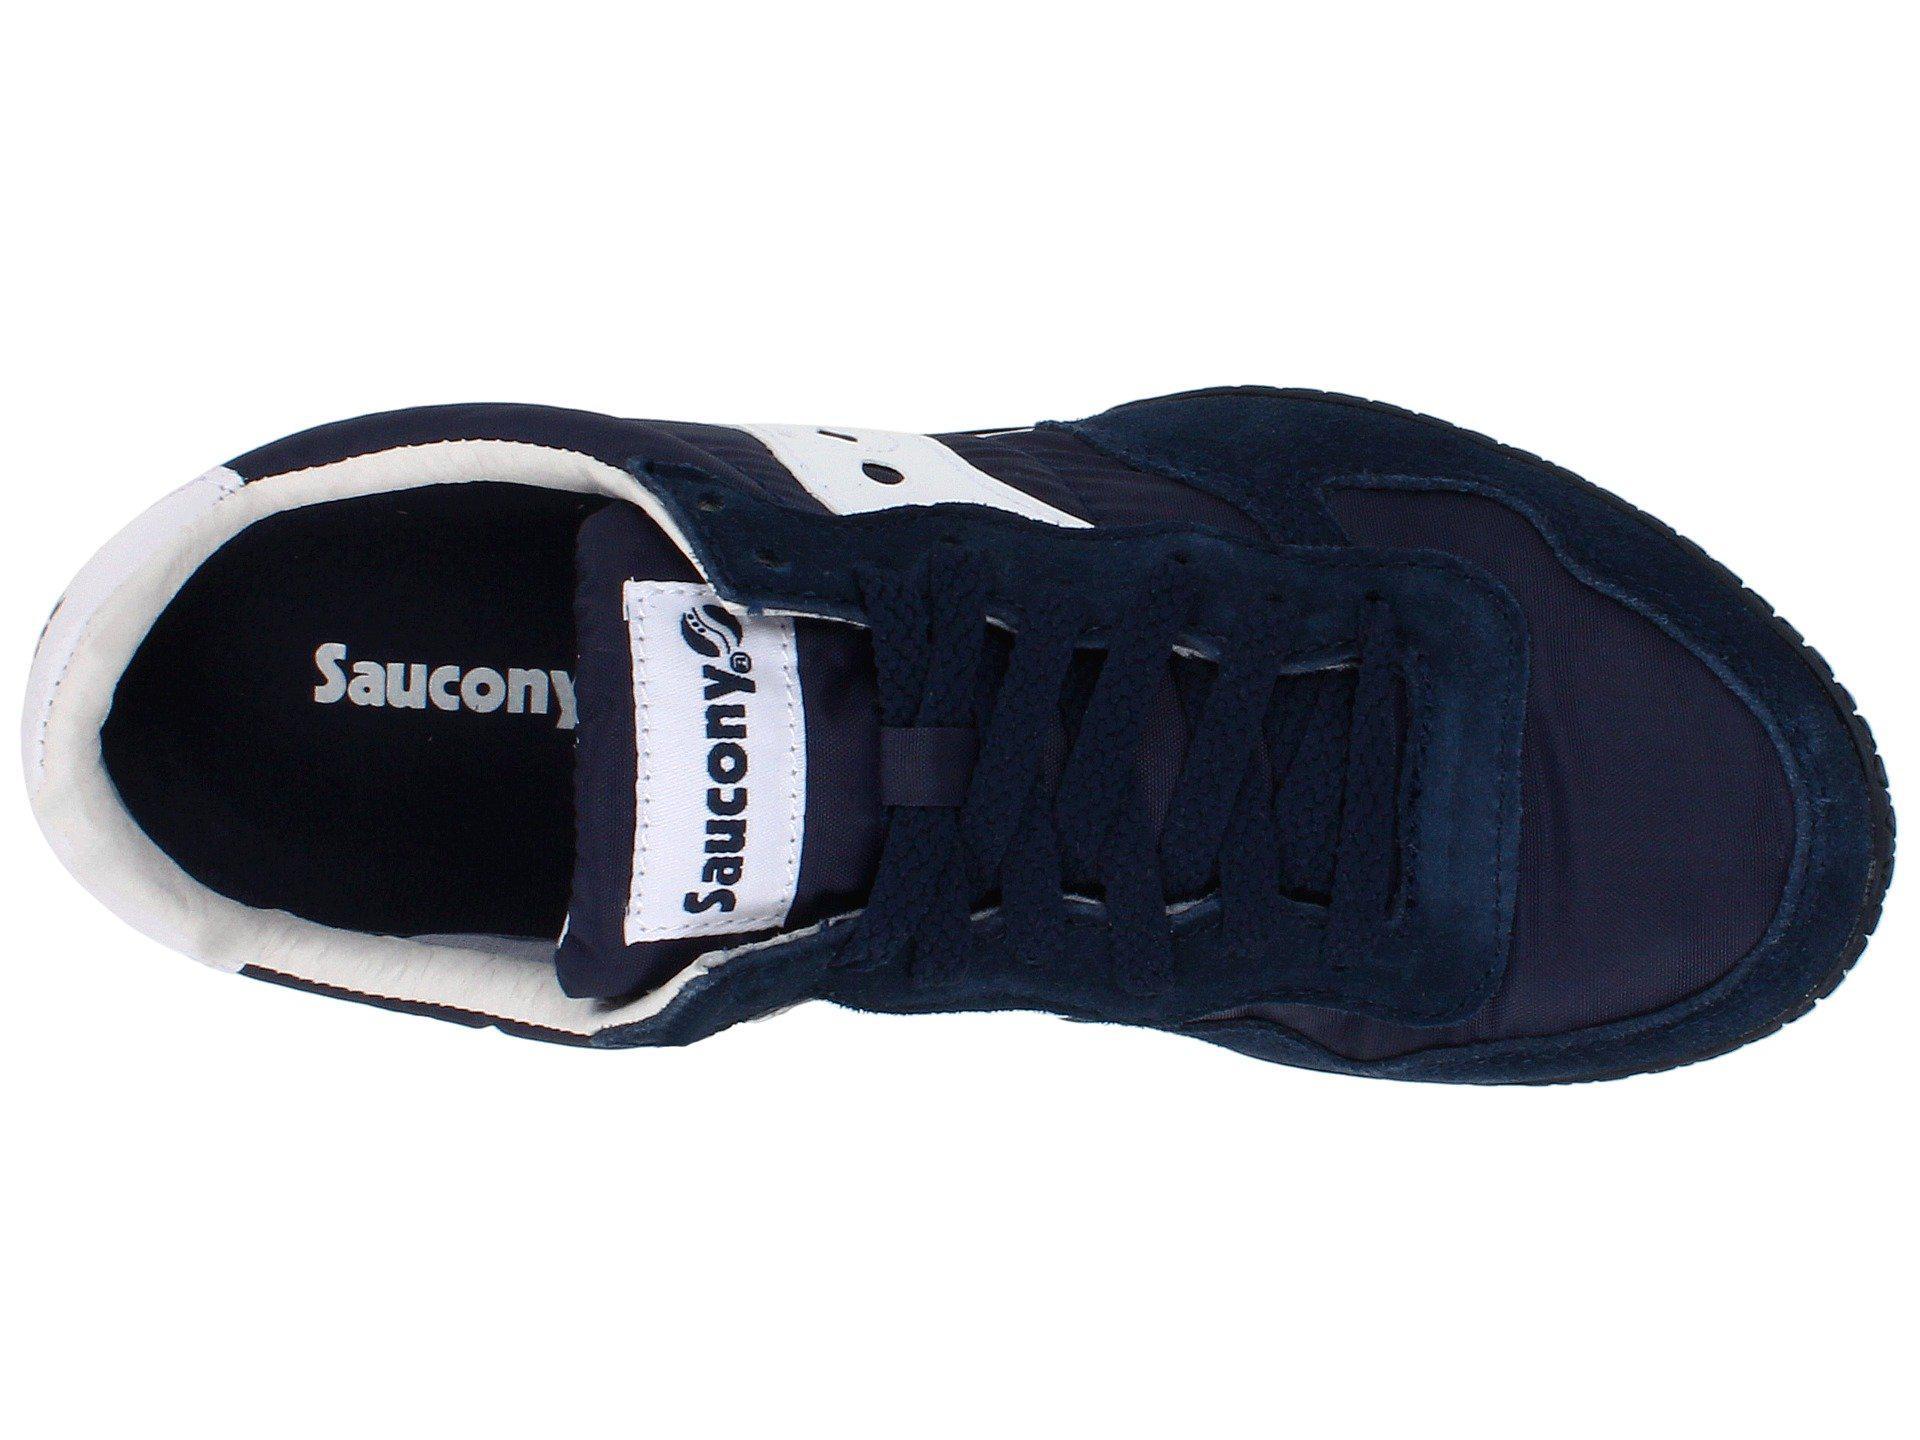 679e8c43e27d Lyst - Saucony Bullet (slate cream) Women s Classic Shoes in Blue